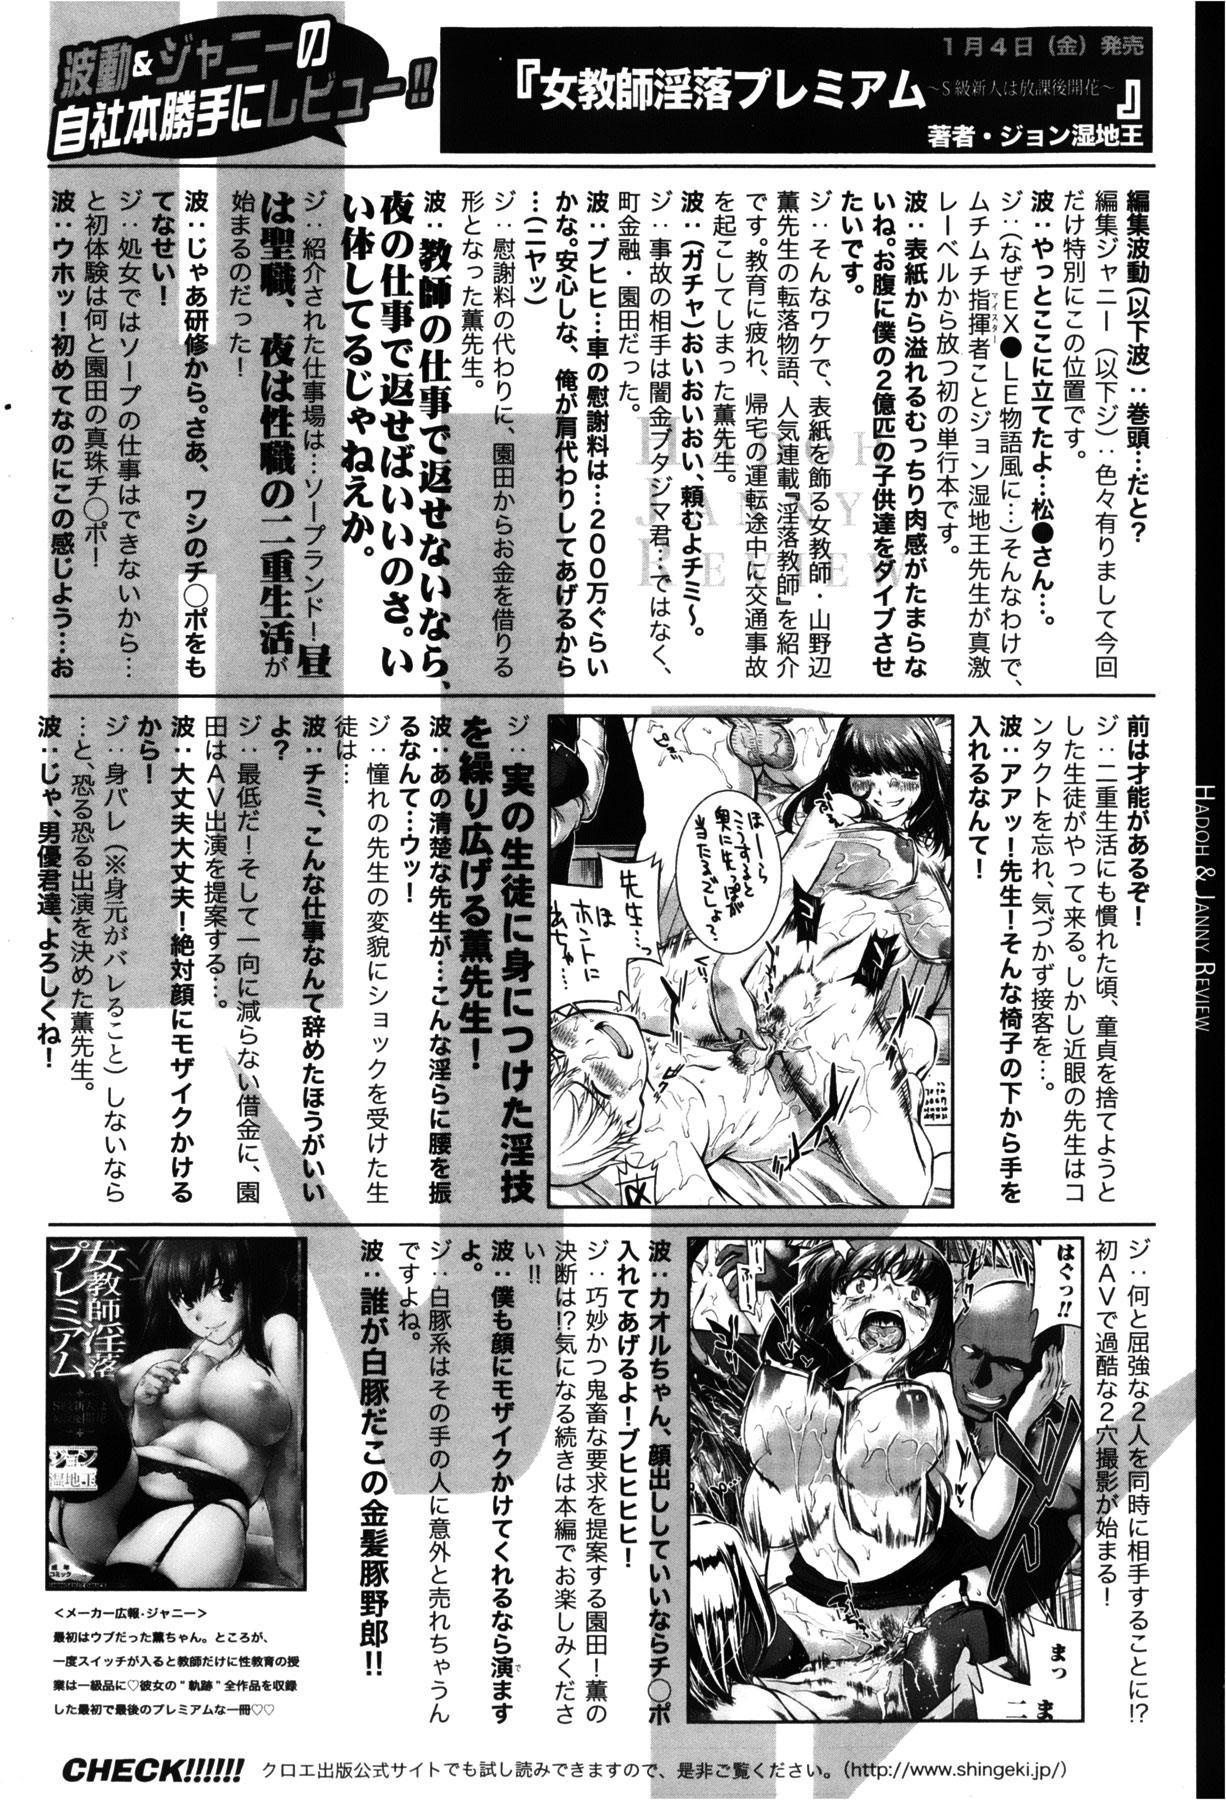 COMIC Shingeki 2013-02 6